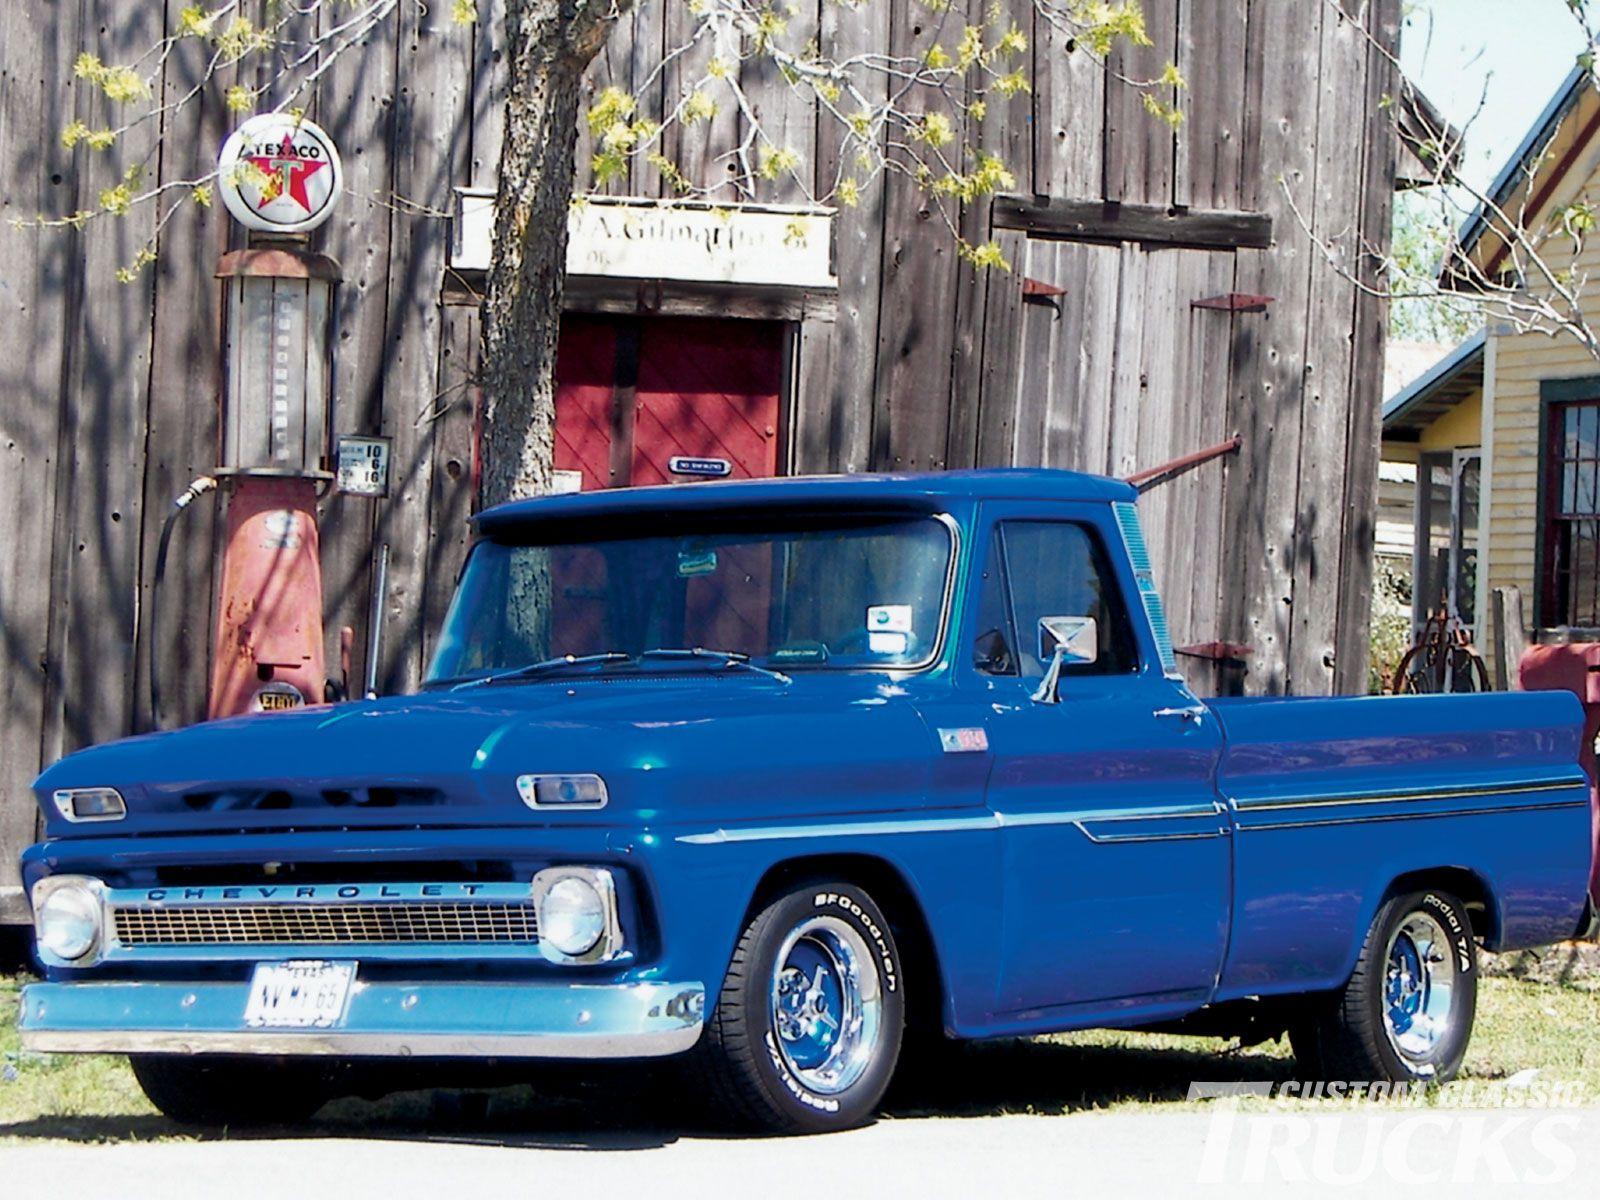 Old Chevy Trucks 1965 Chevy C10 Pickup Truck Restored